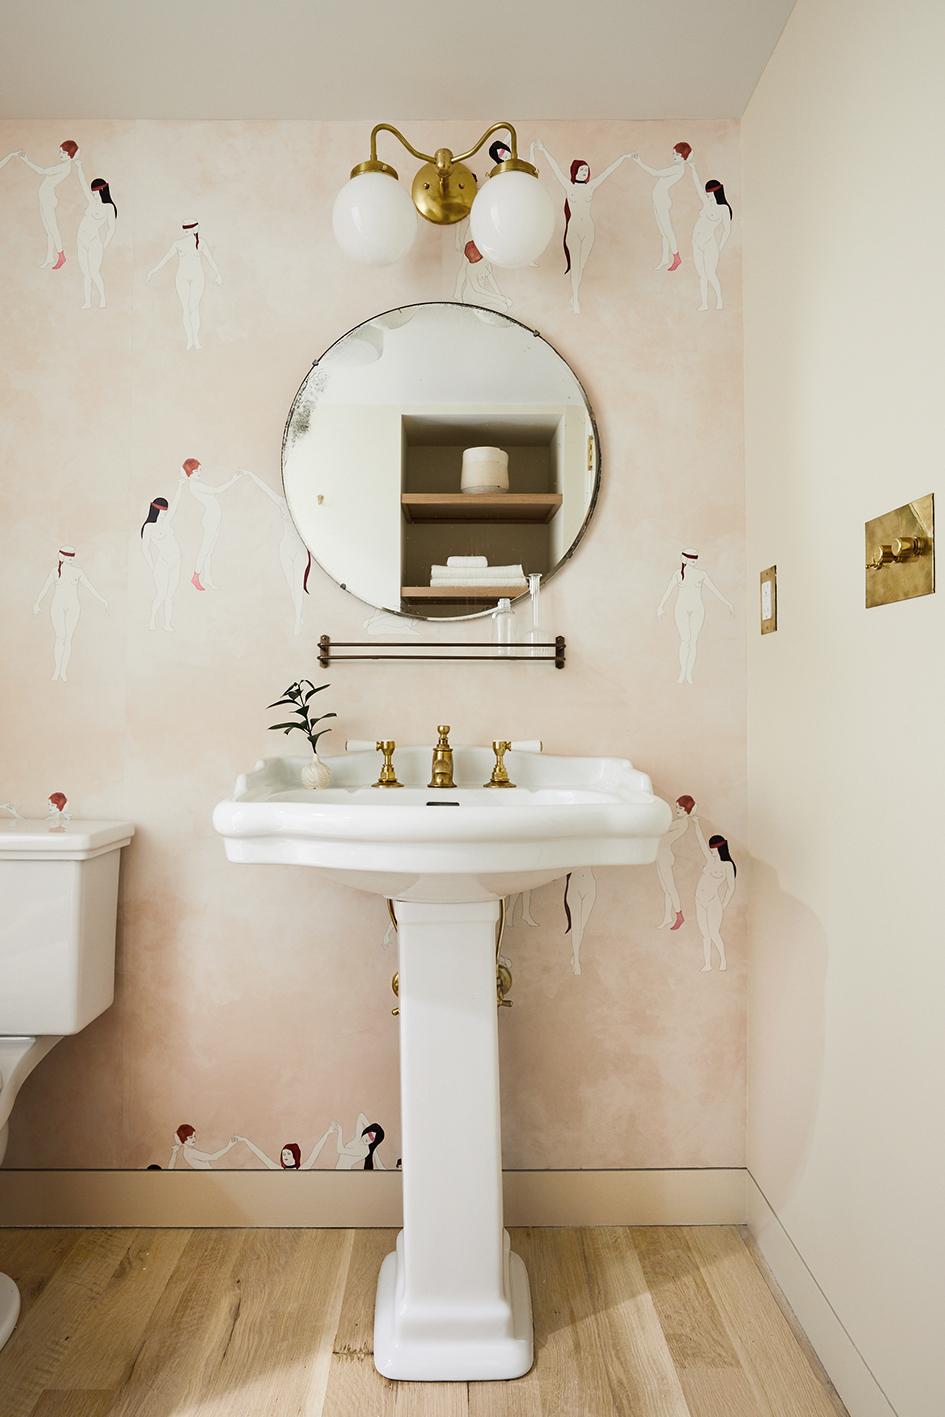 z. Garden Bathroom Slope_Townhouse_Bathroom_Ground_Floor_005_edit.jpg